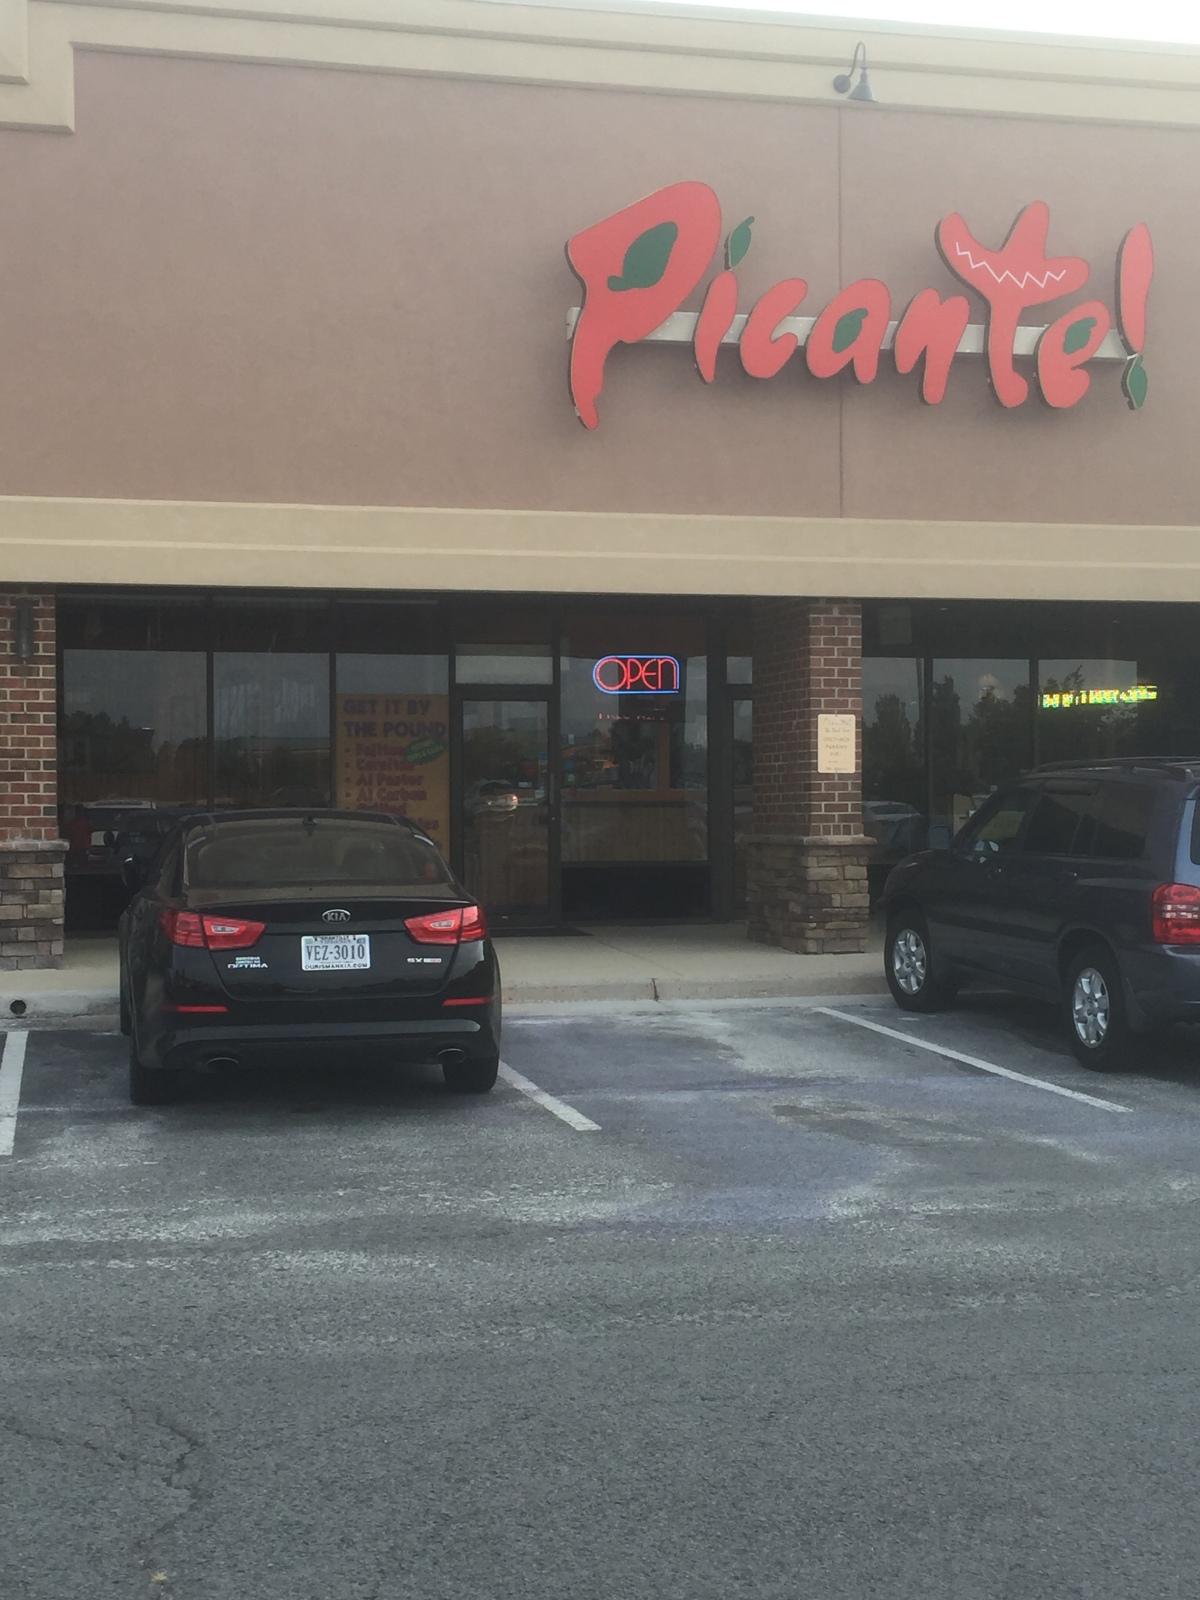 Picante! – A Restaurant With Social MediaSavvy